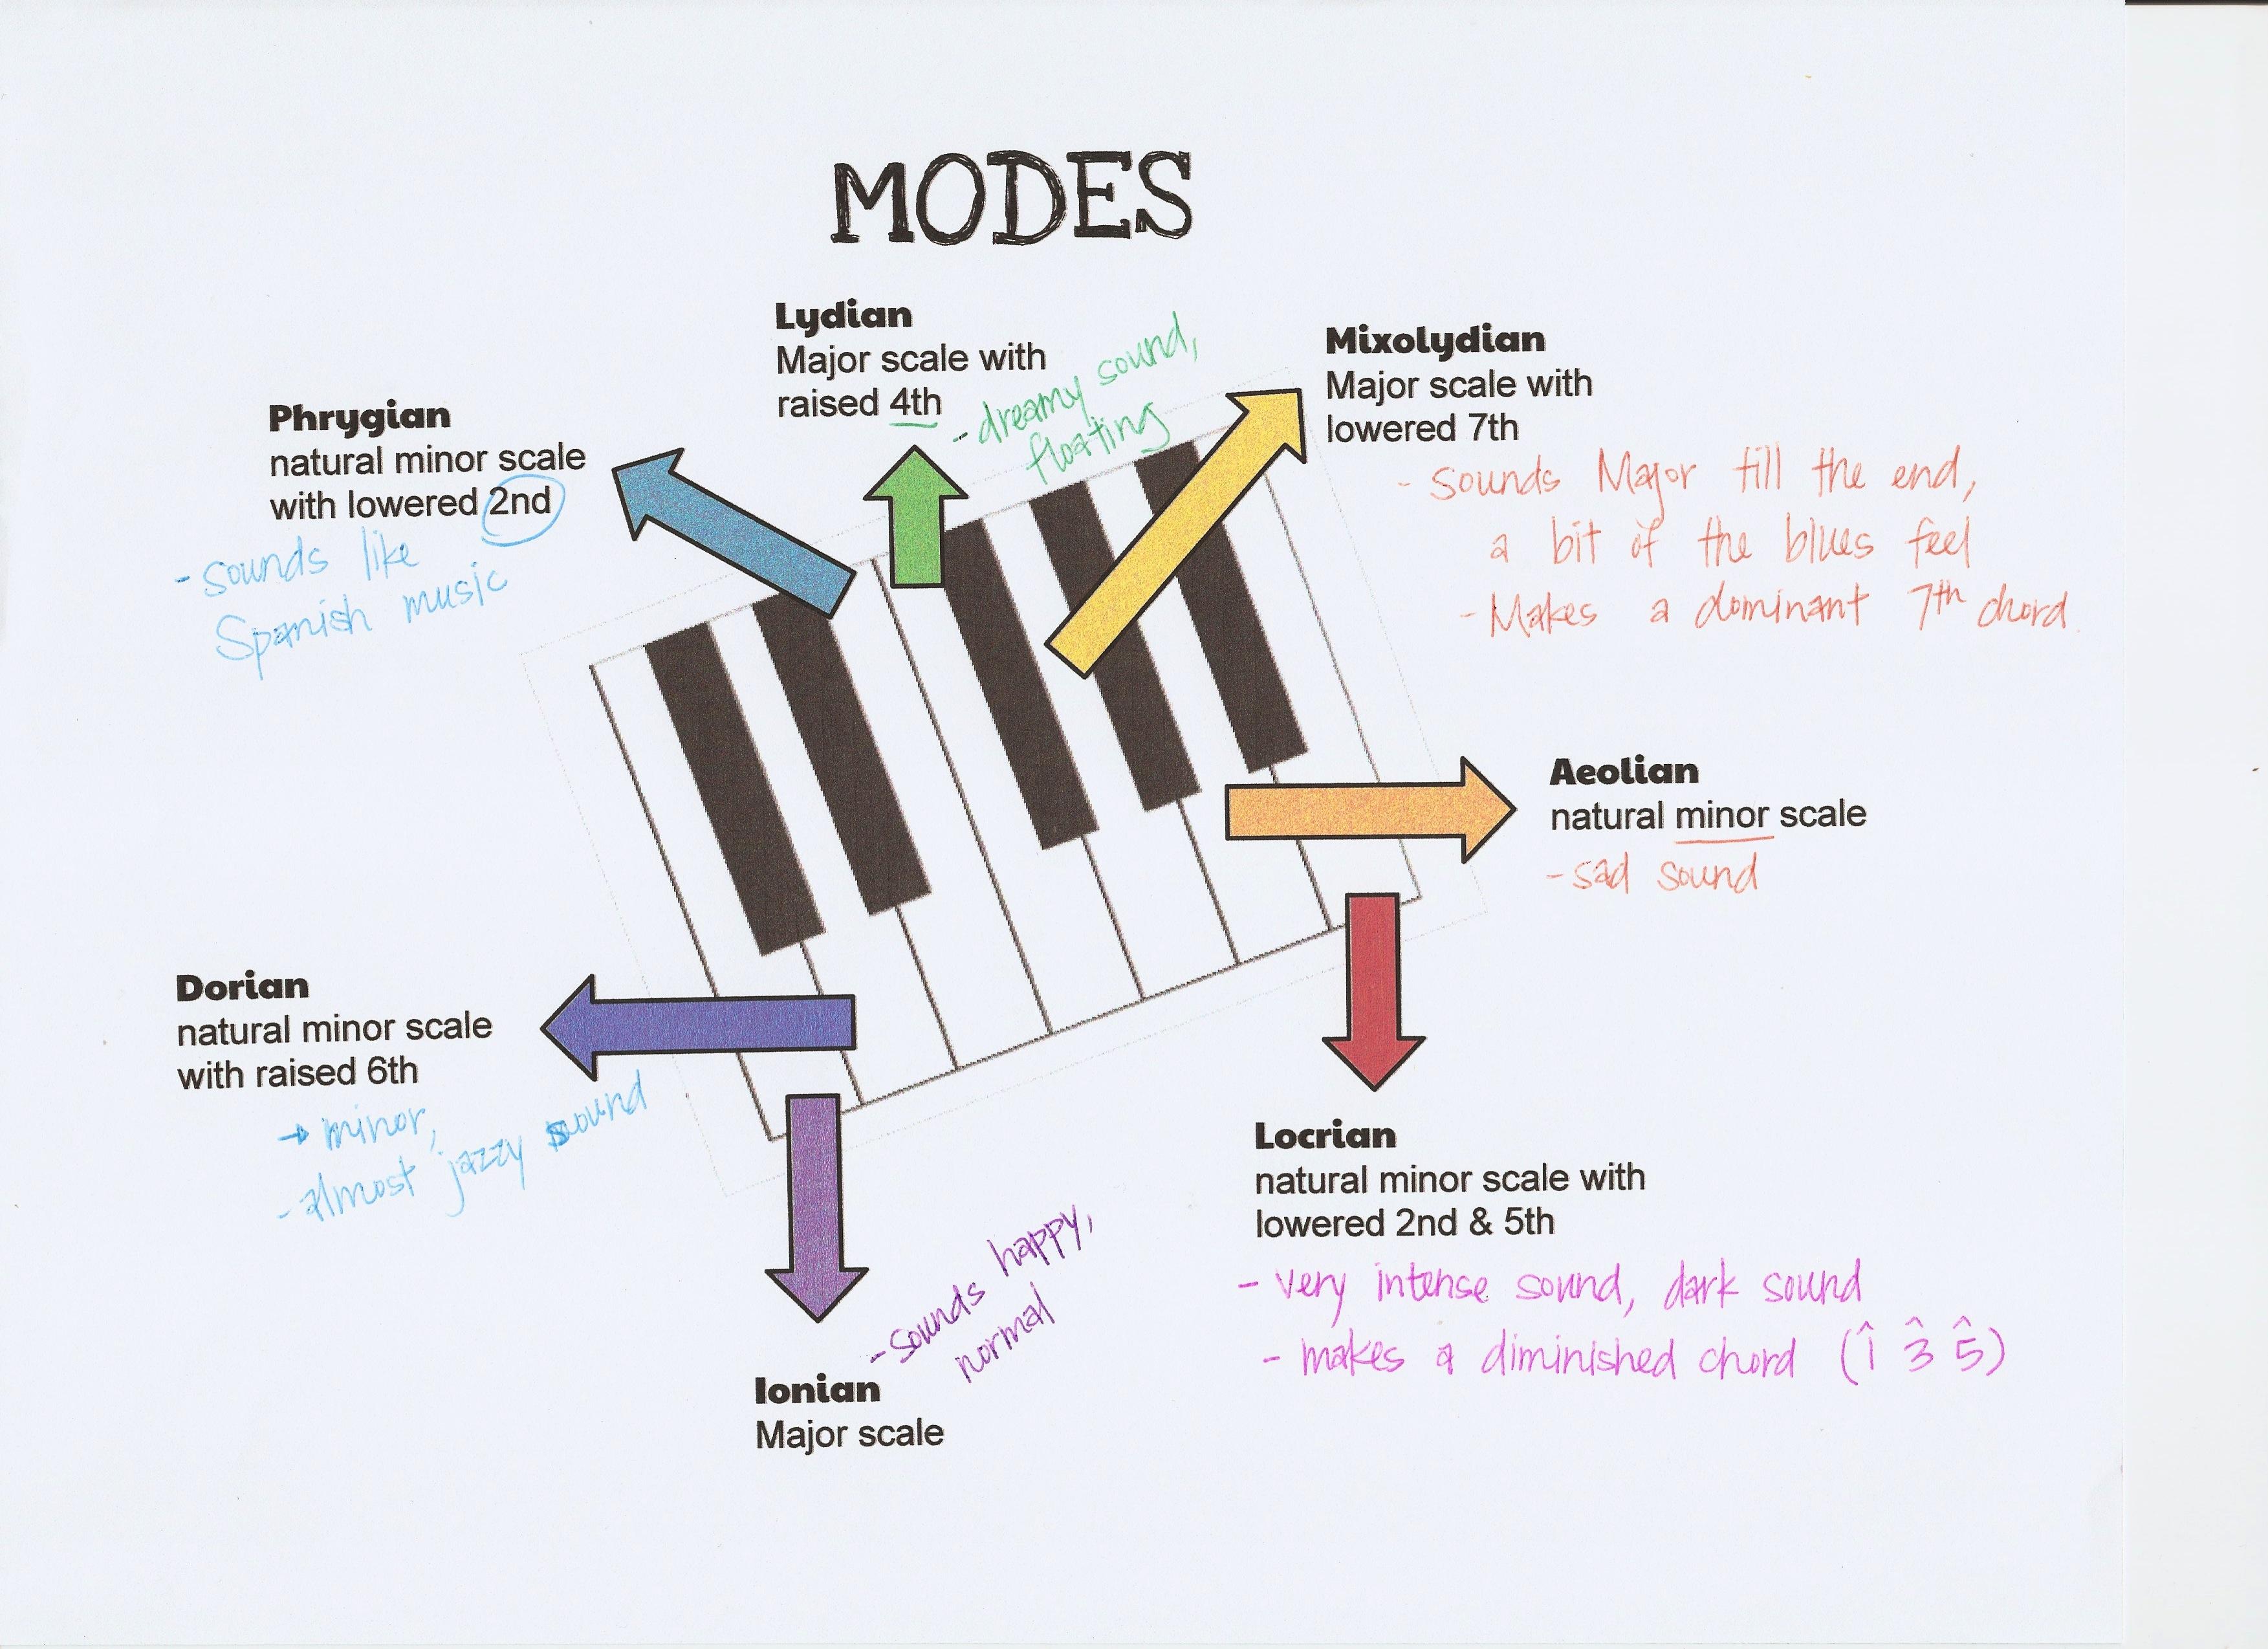 Ideas For Teaching Modes